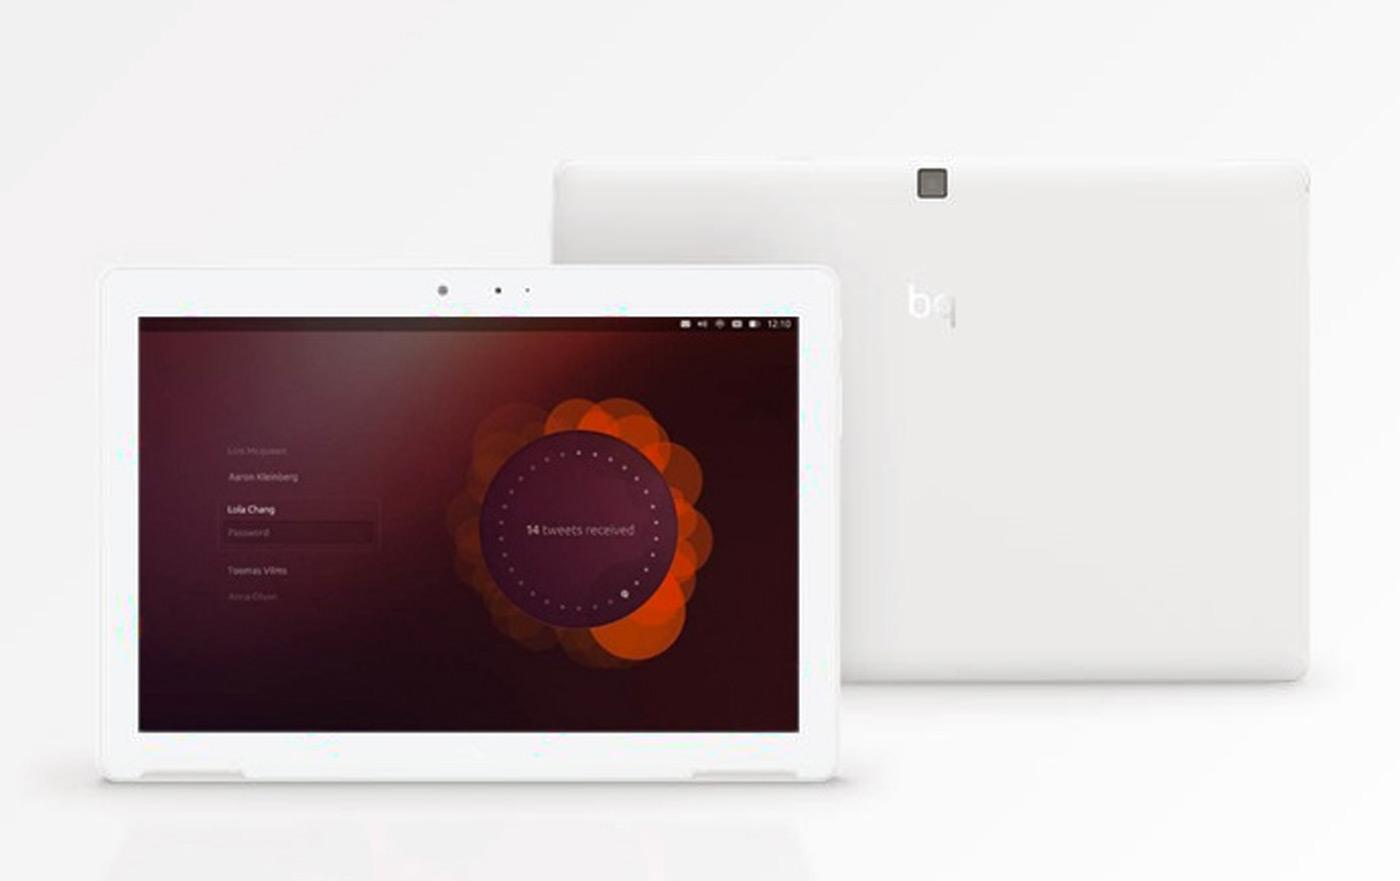 Ubuntu Linux tablet will turn into a makeshift desktop